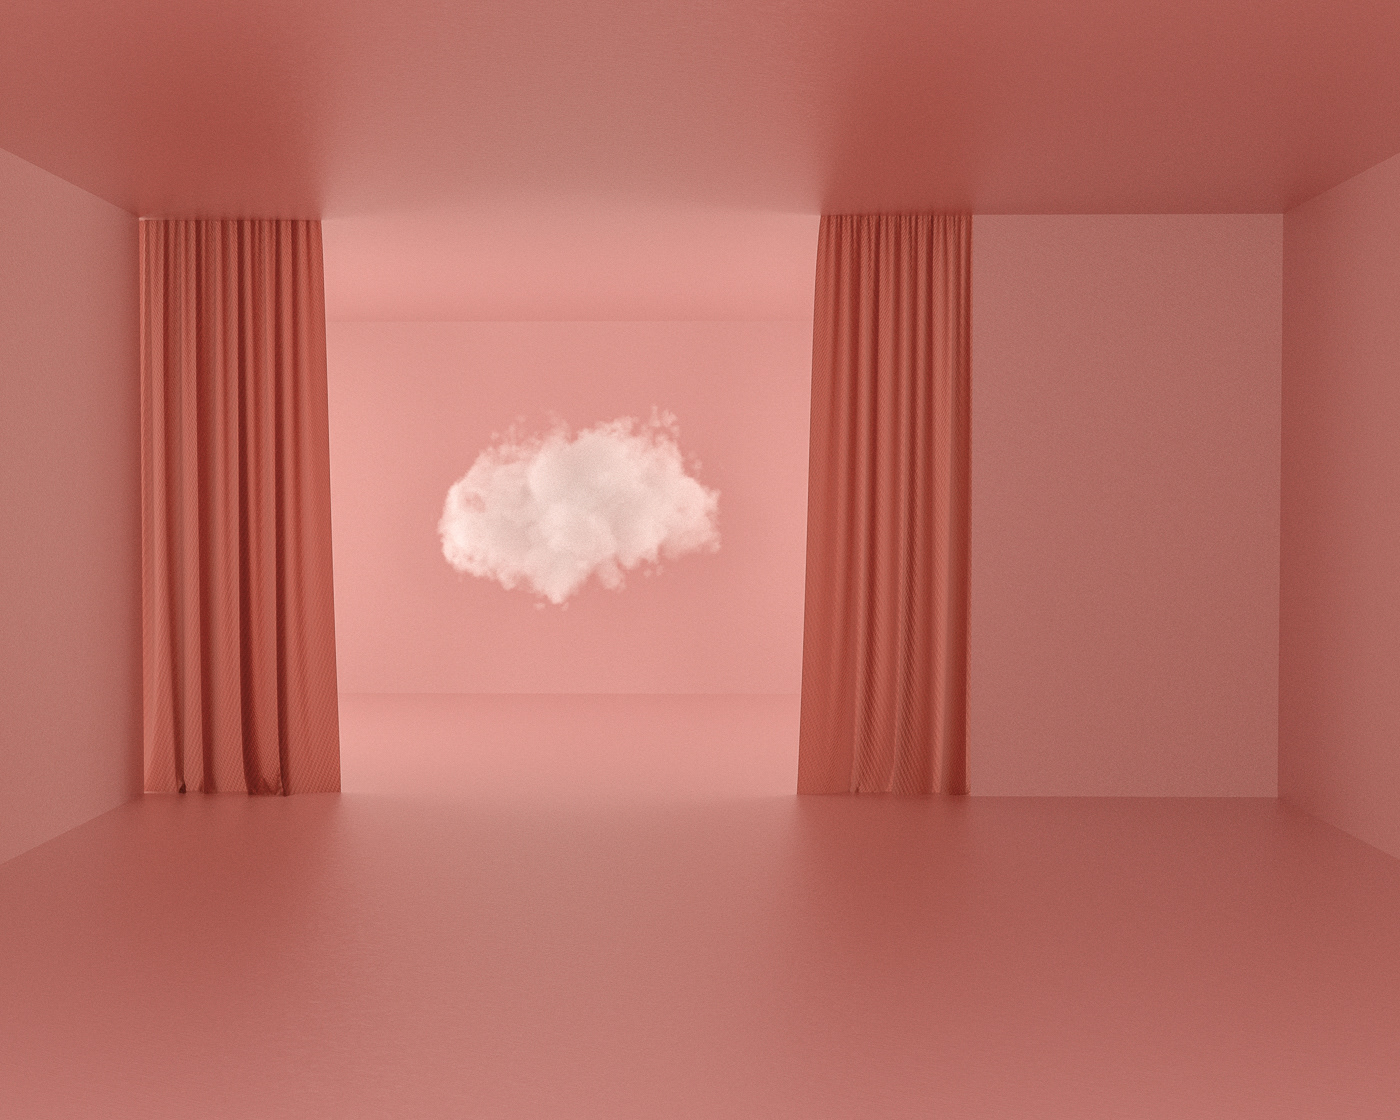 Image may contain: wall and curtain